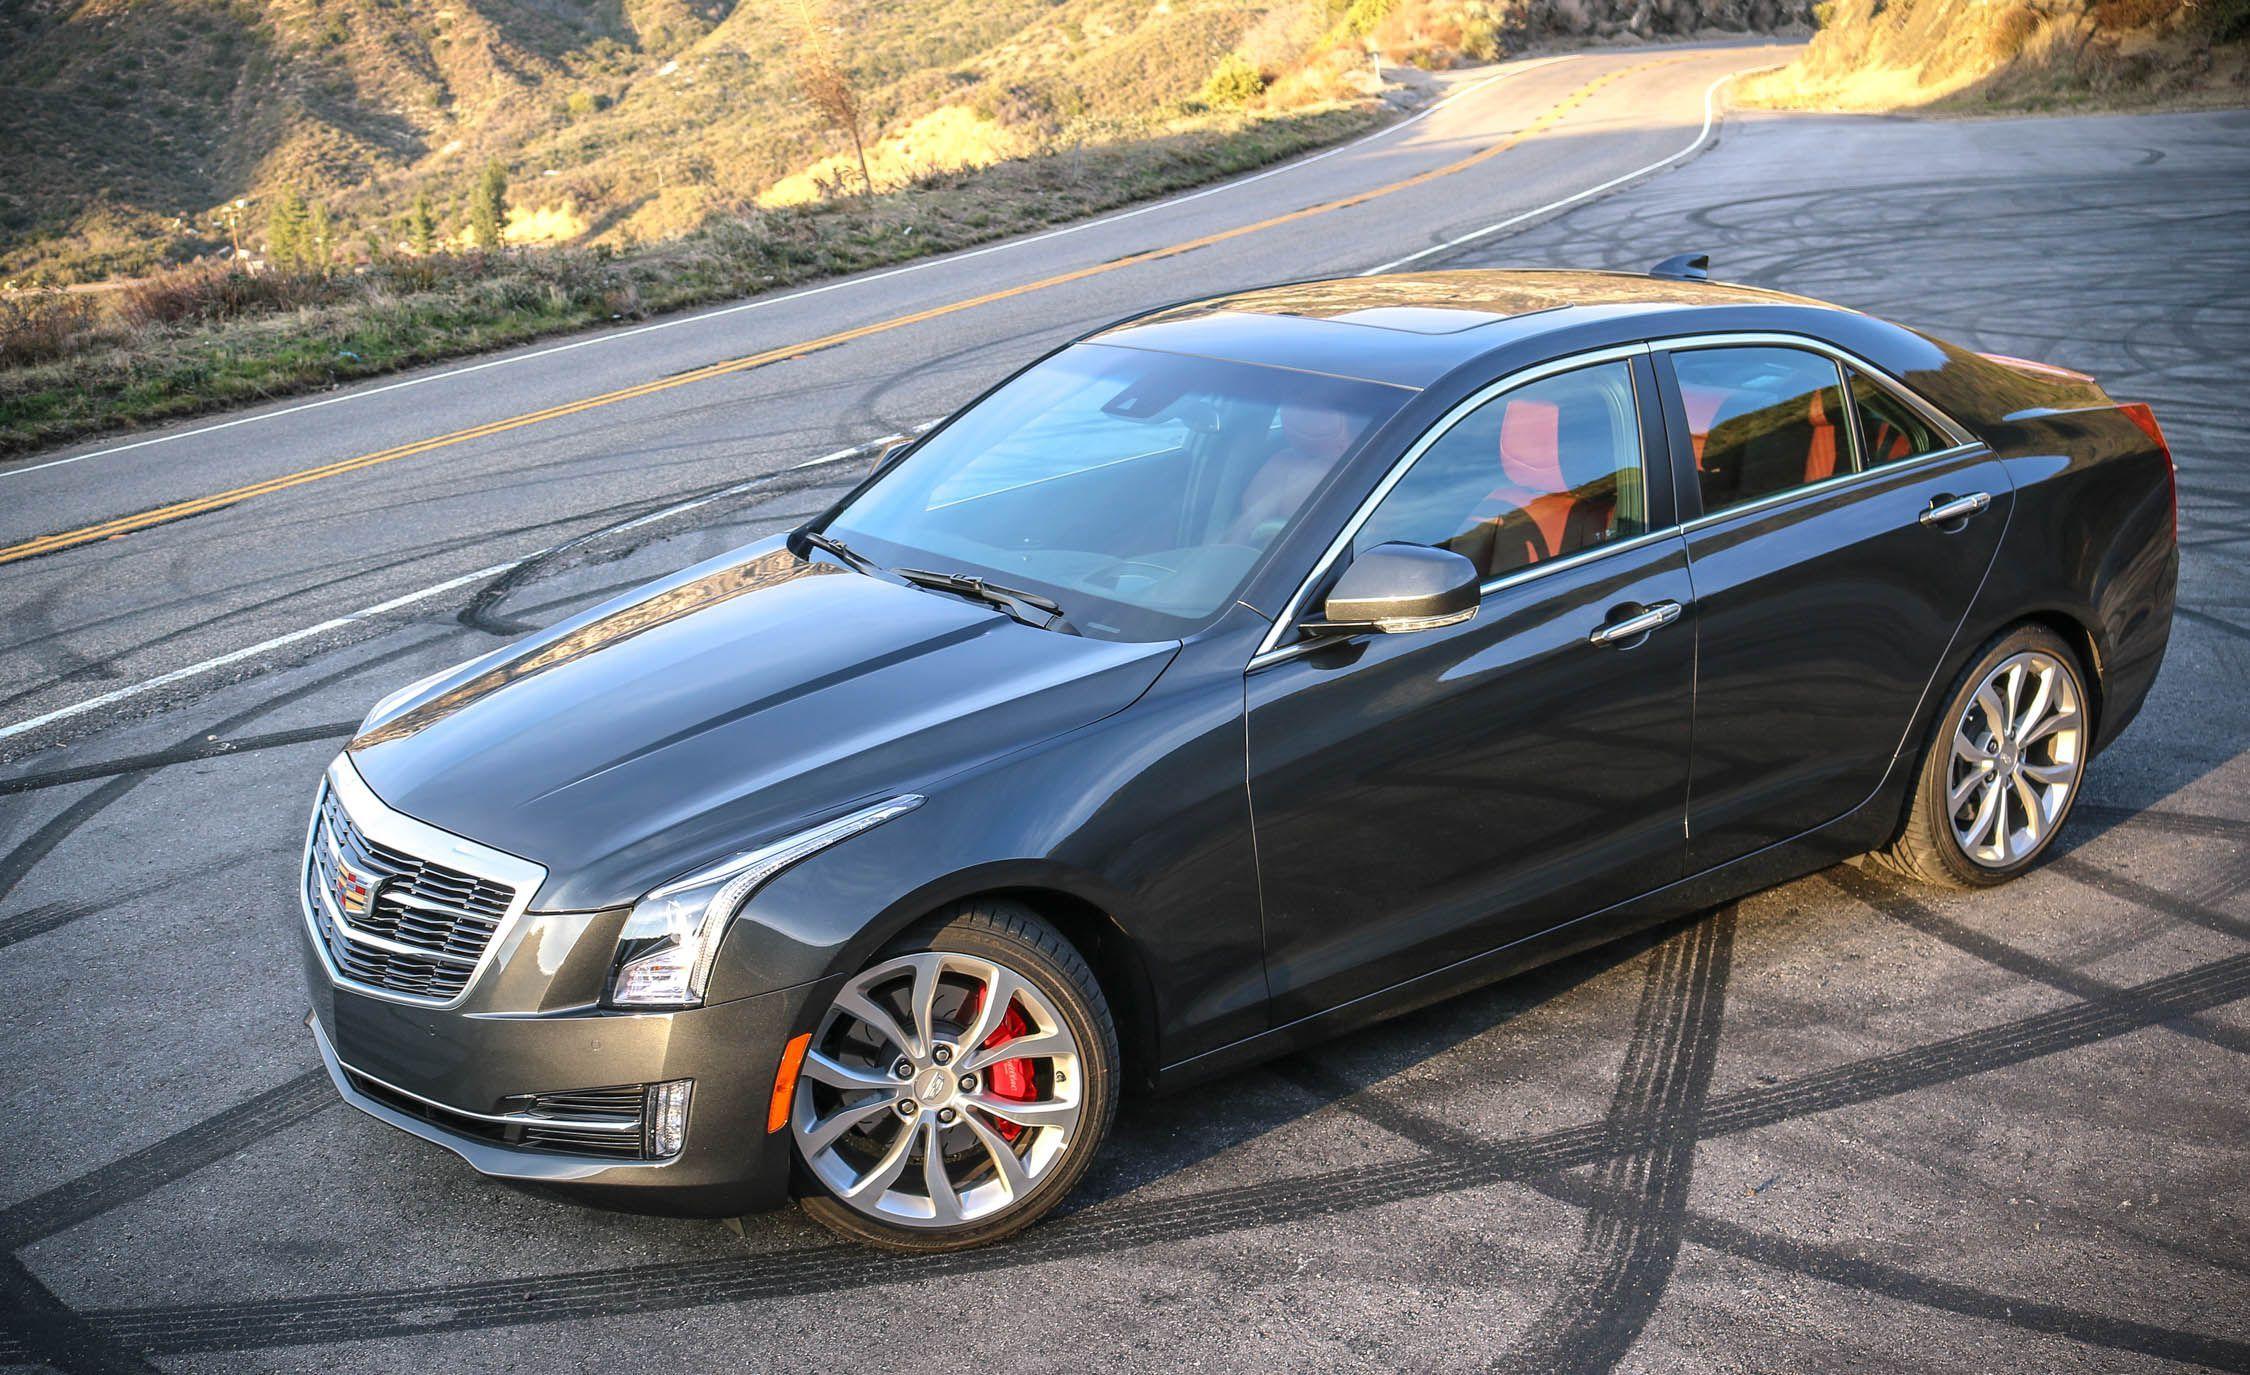 Cadillac Ending ATS Sedan Production